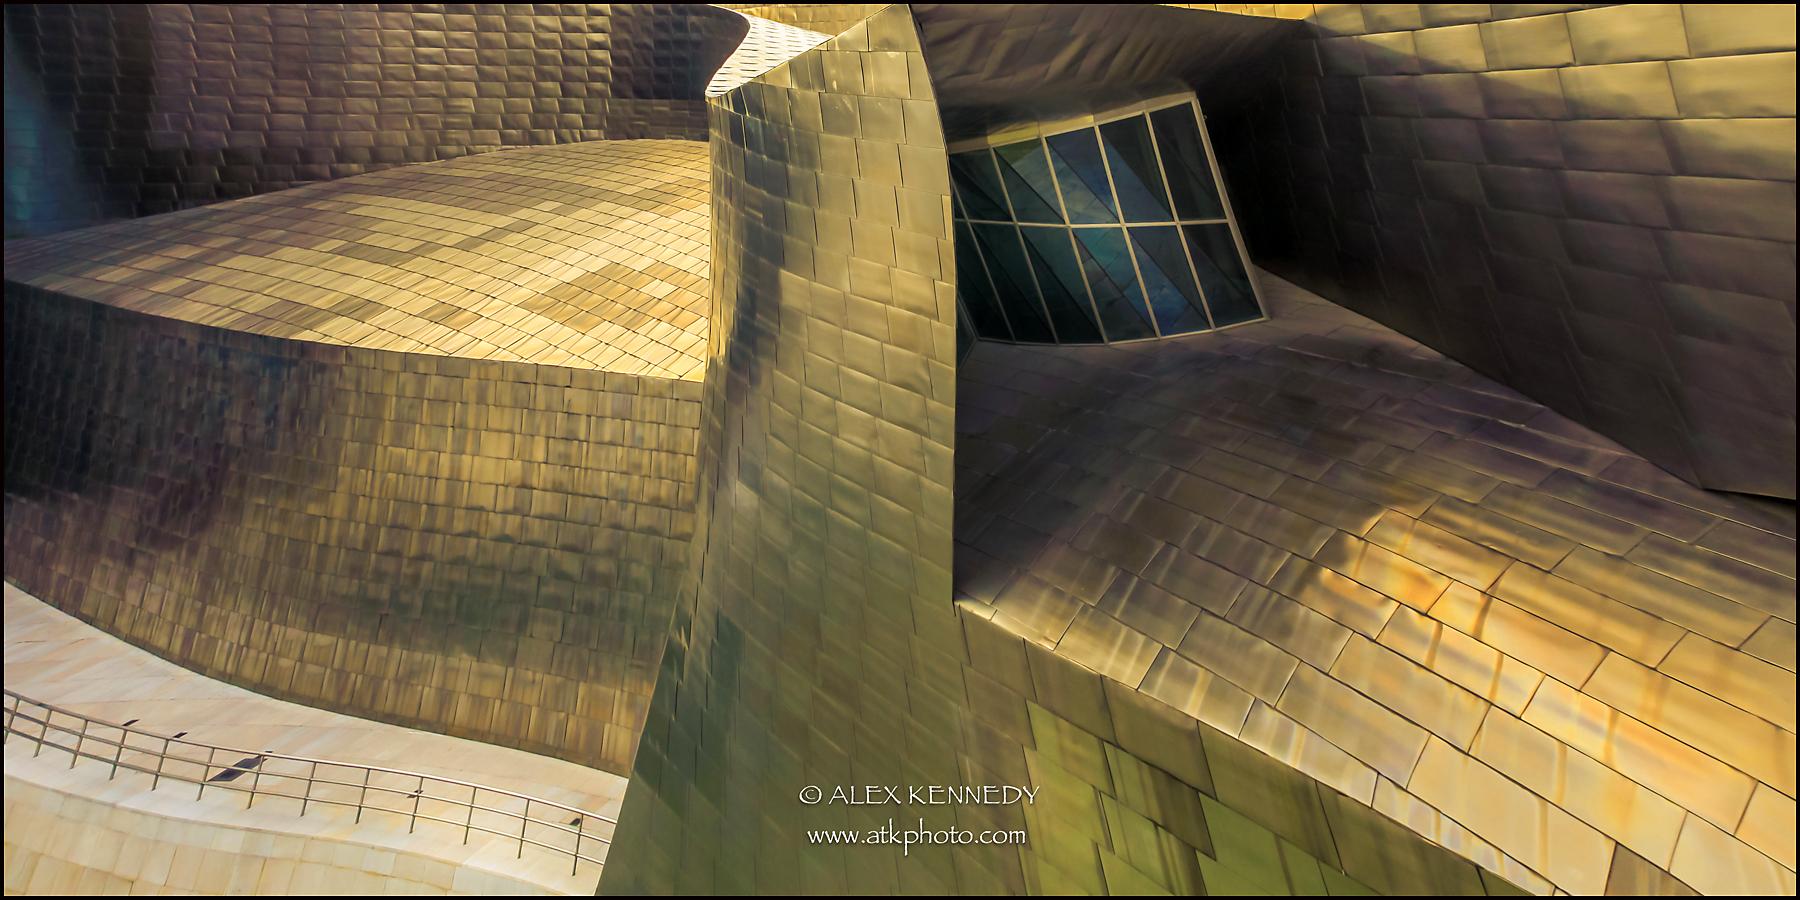 fine art photography - Guggenheim Museum - Bilbao - Spain - fine art photography